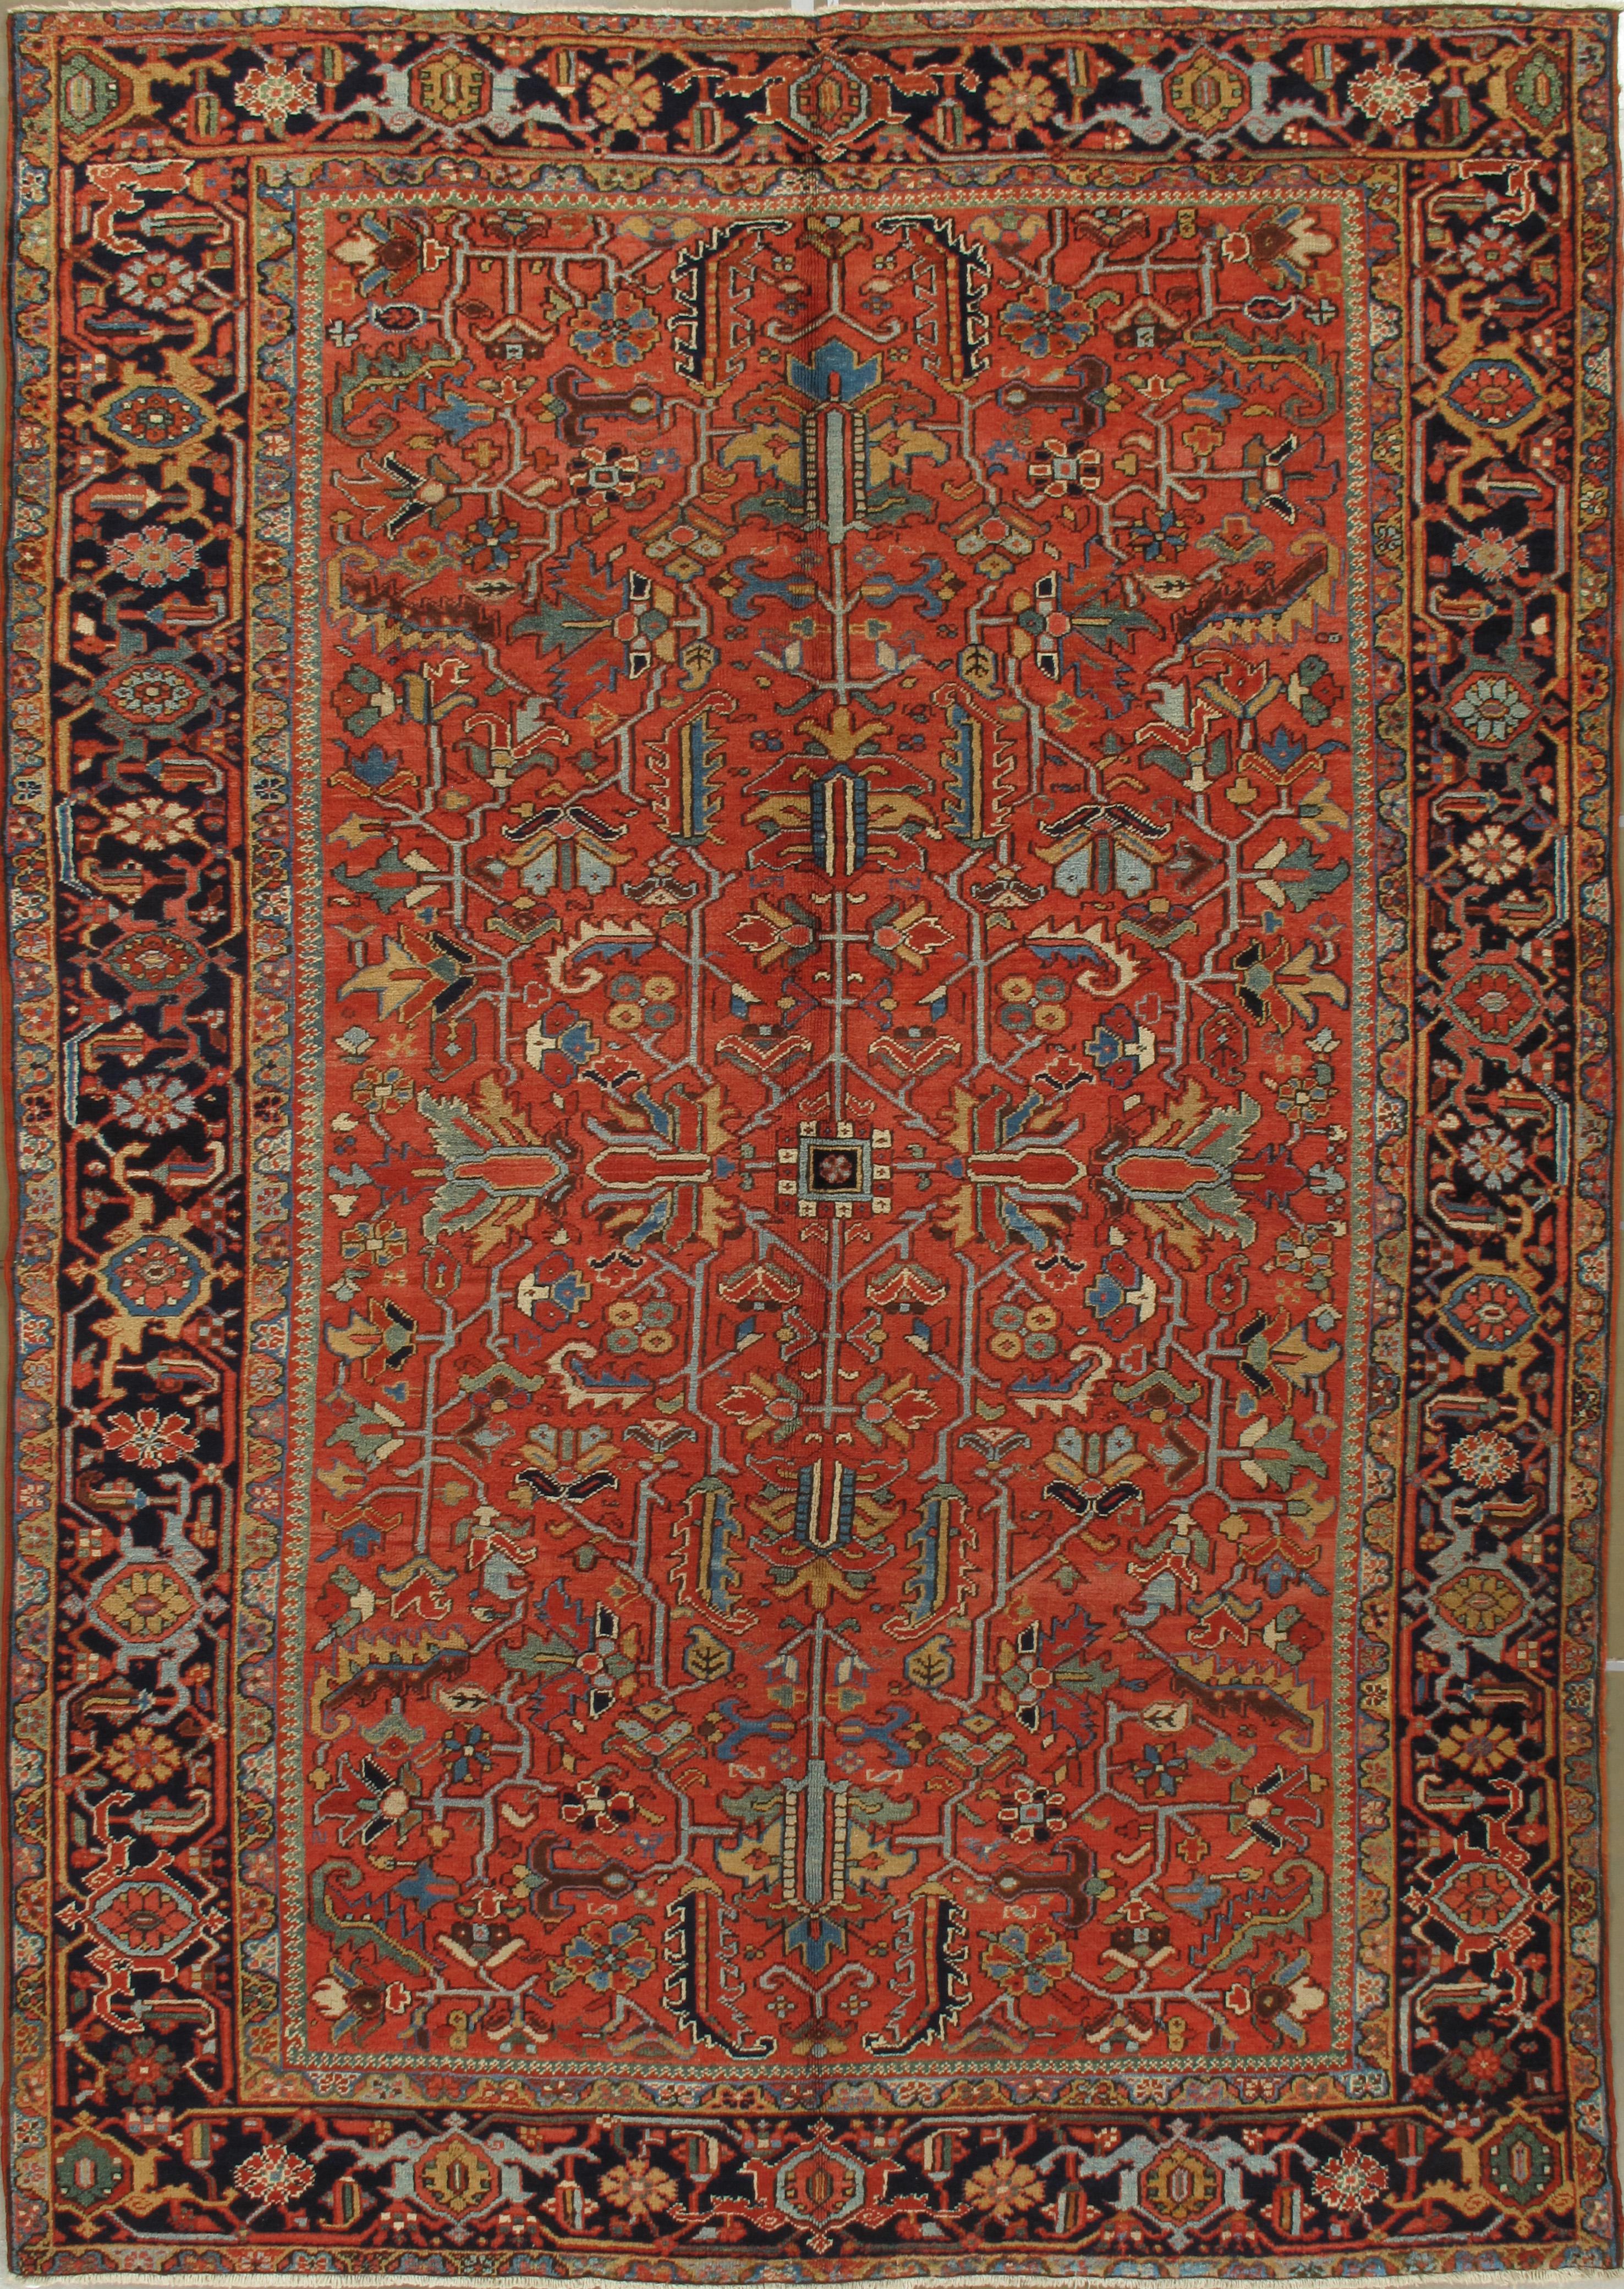 Geometric Antique Persian Heriz Rug